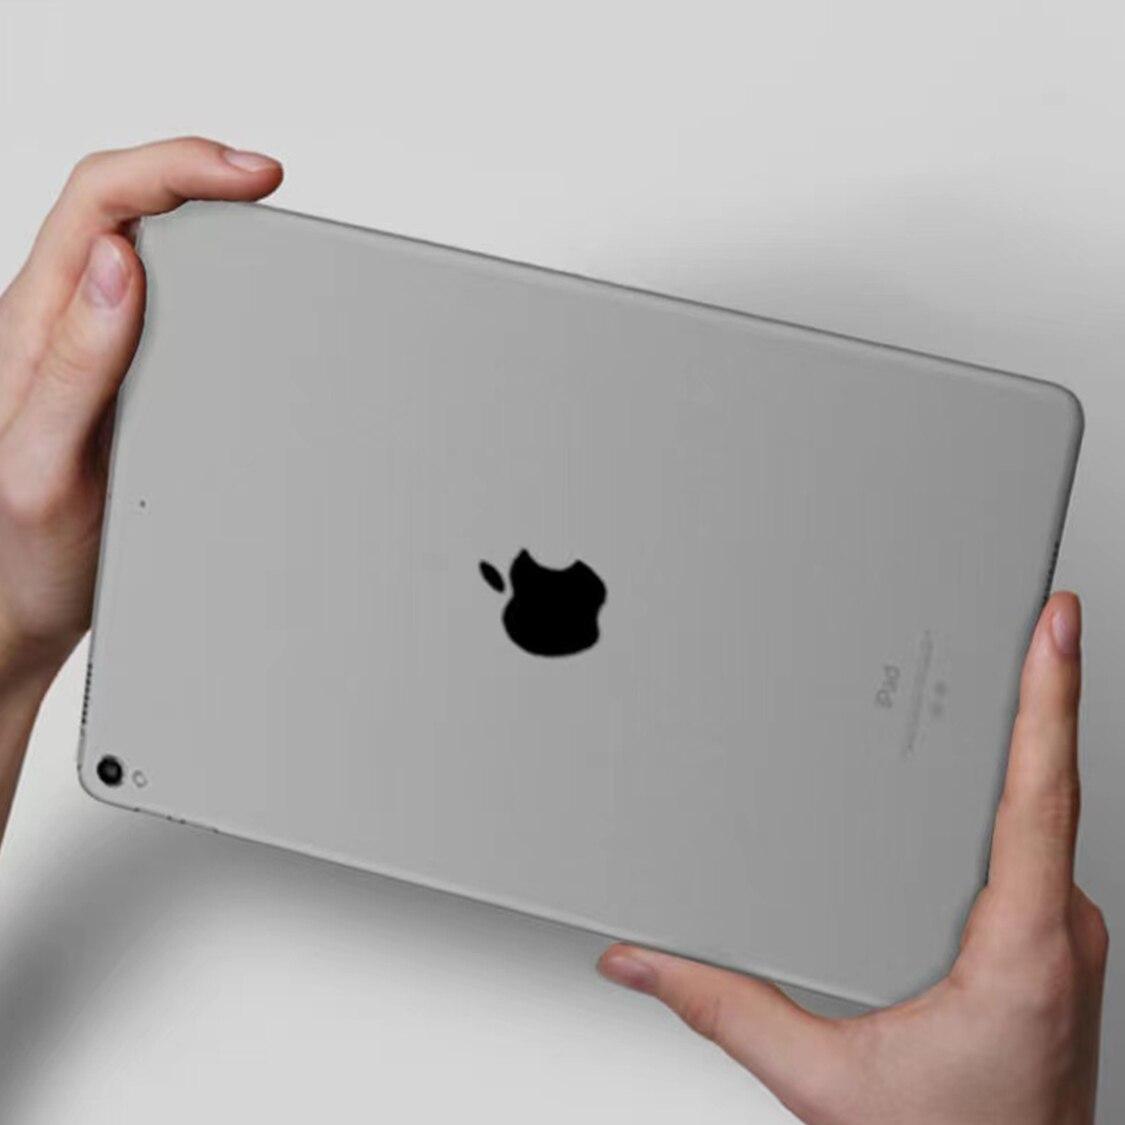 Apple ipad mini 1st 7.9 polegada 2012 original usado 90% novo 16/32/64gb preto prata ios tablet wifi versão duplo-core a5 5mp